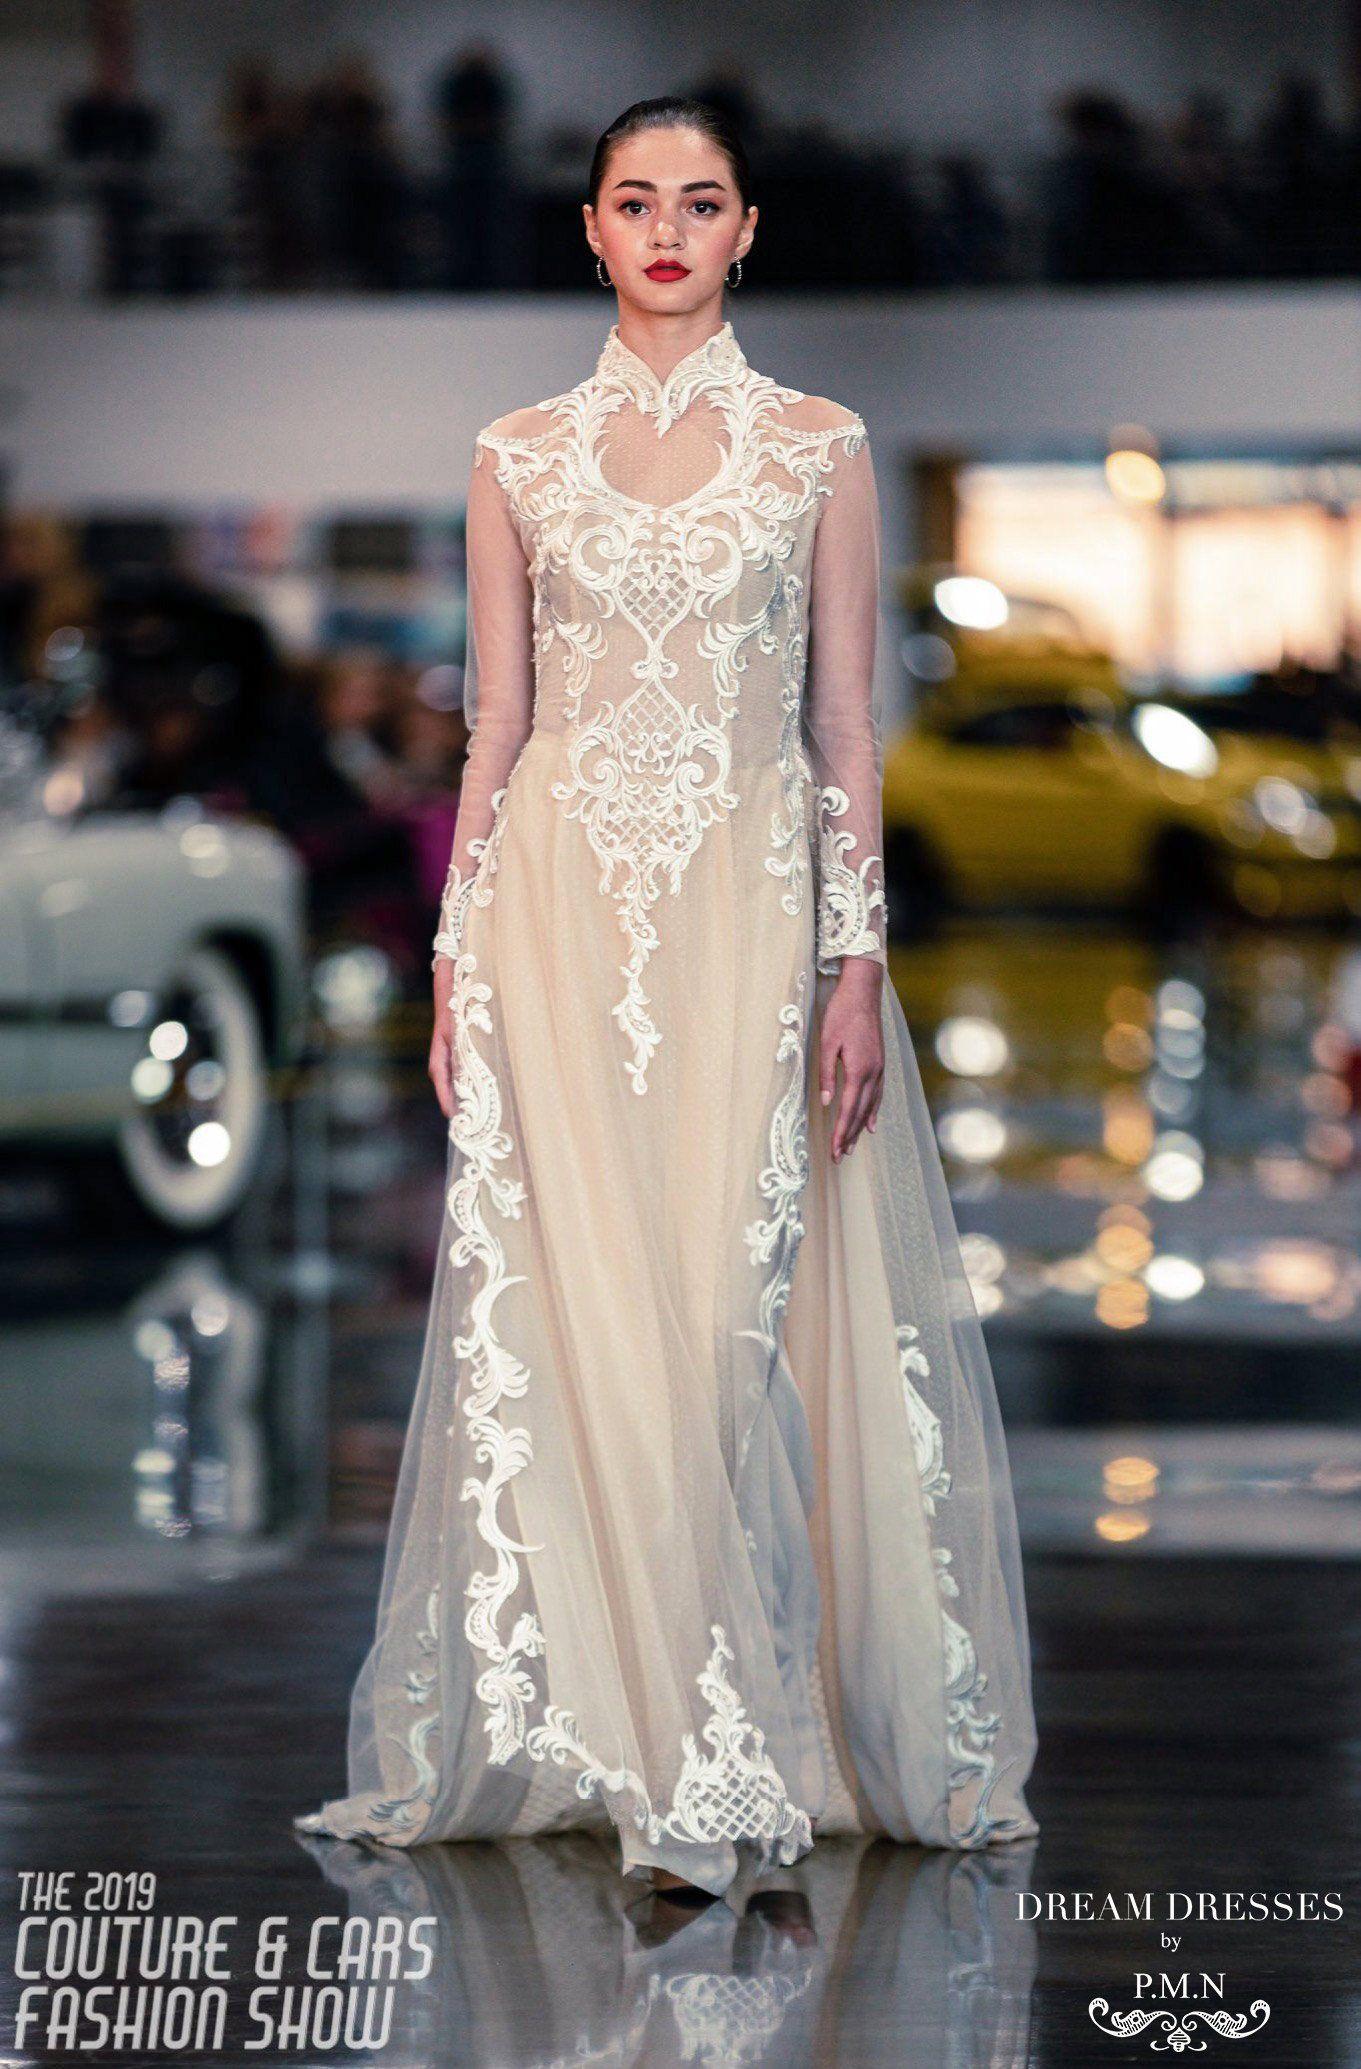 White Ao Dai Vietnamese Lace Bridal Dress (CINDA